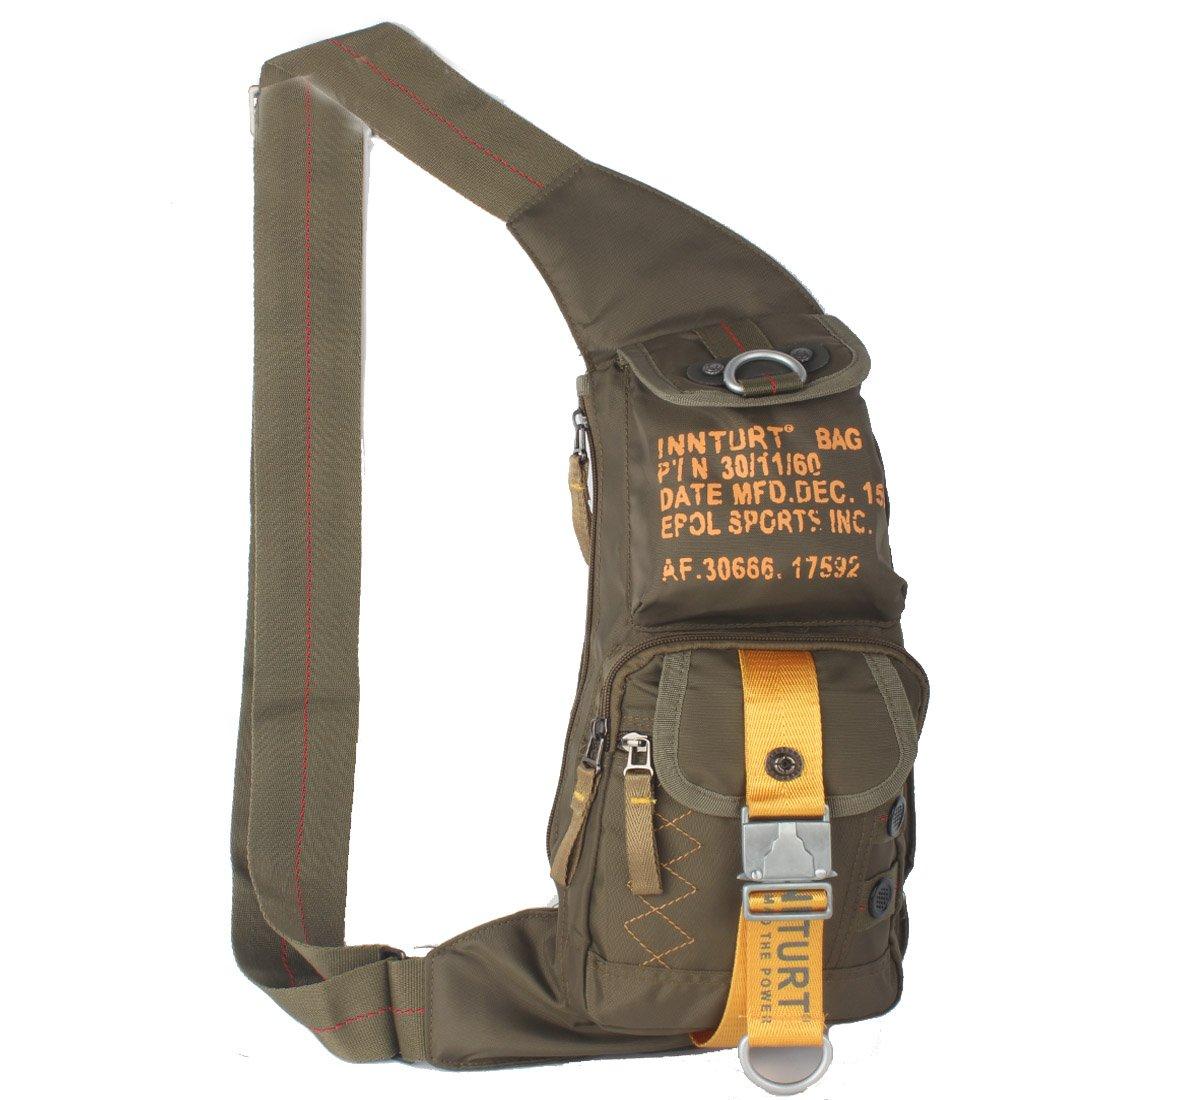 Amazon.com : Kawei Knight Nylon Sling Chest Bag Multi-pocket ...